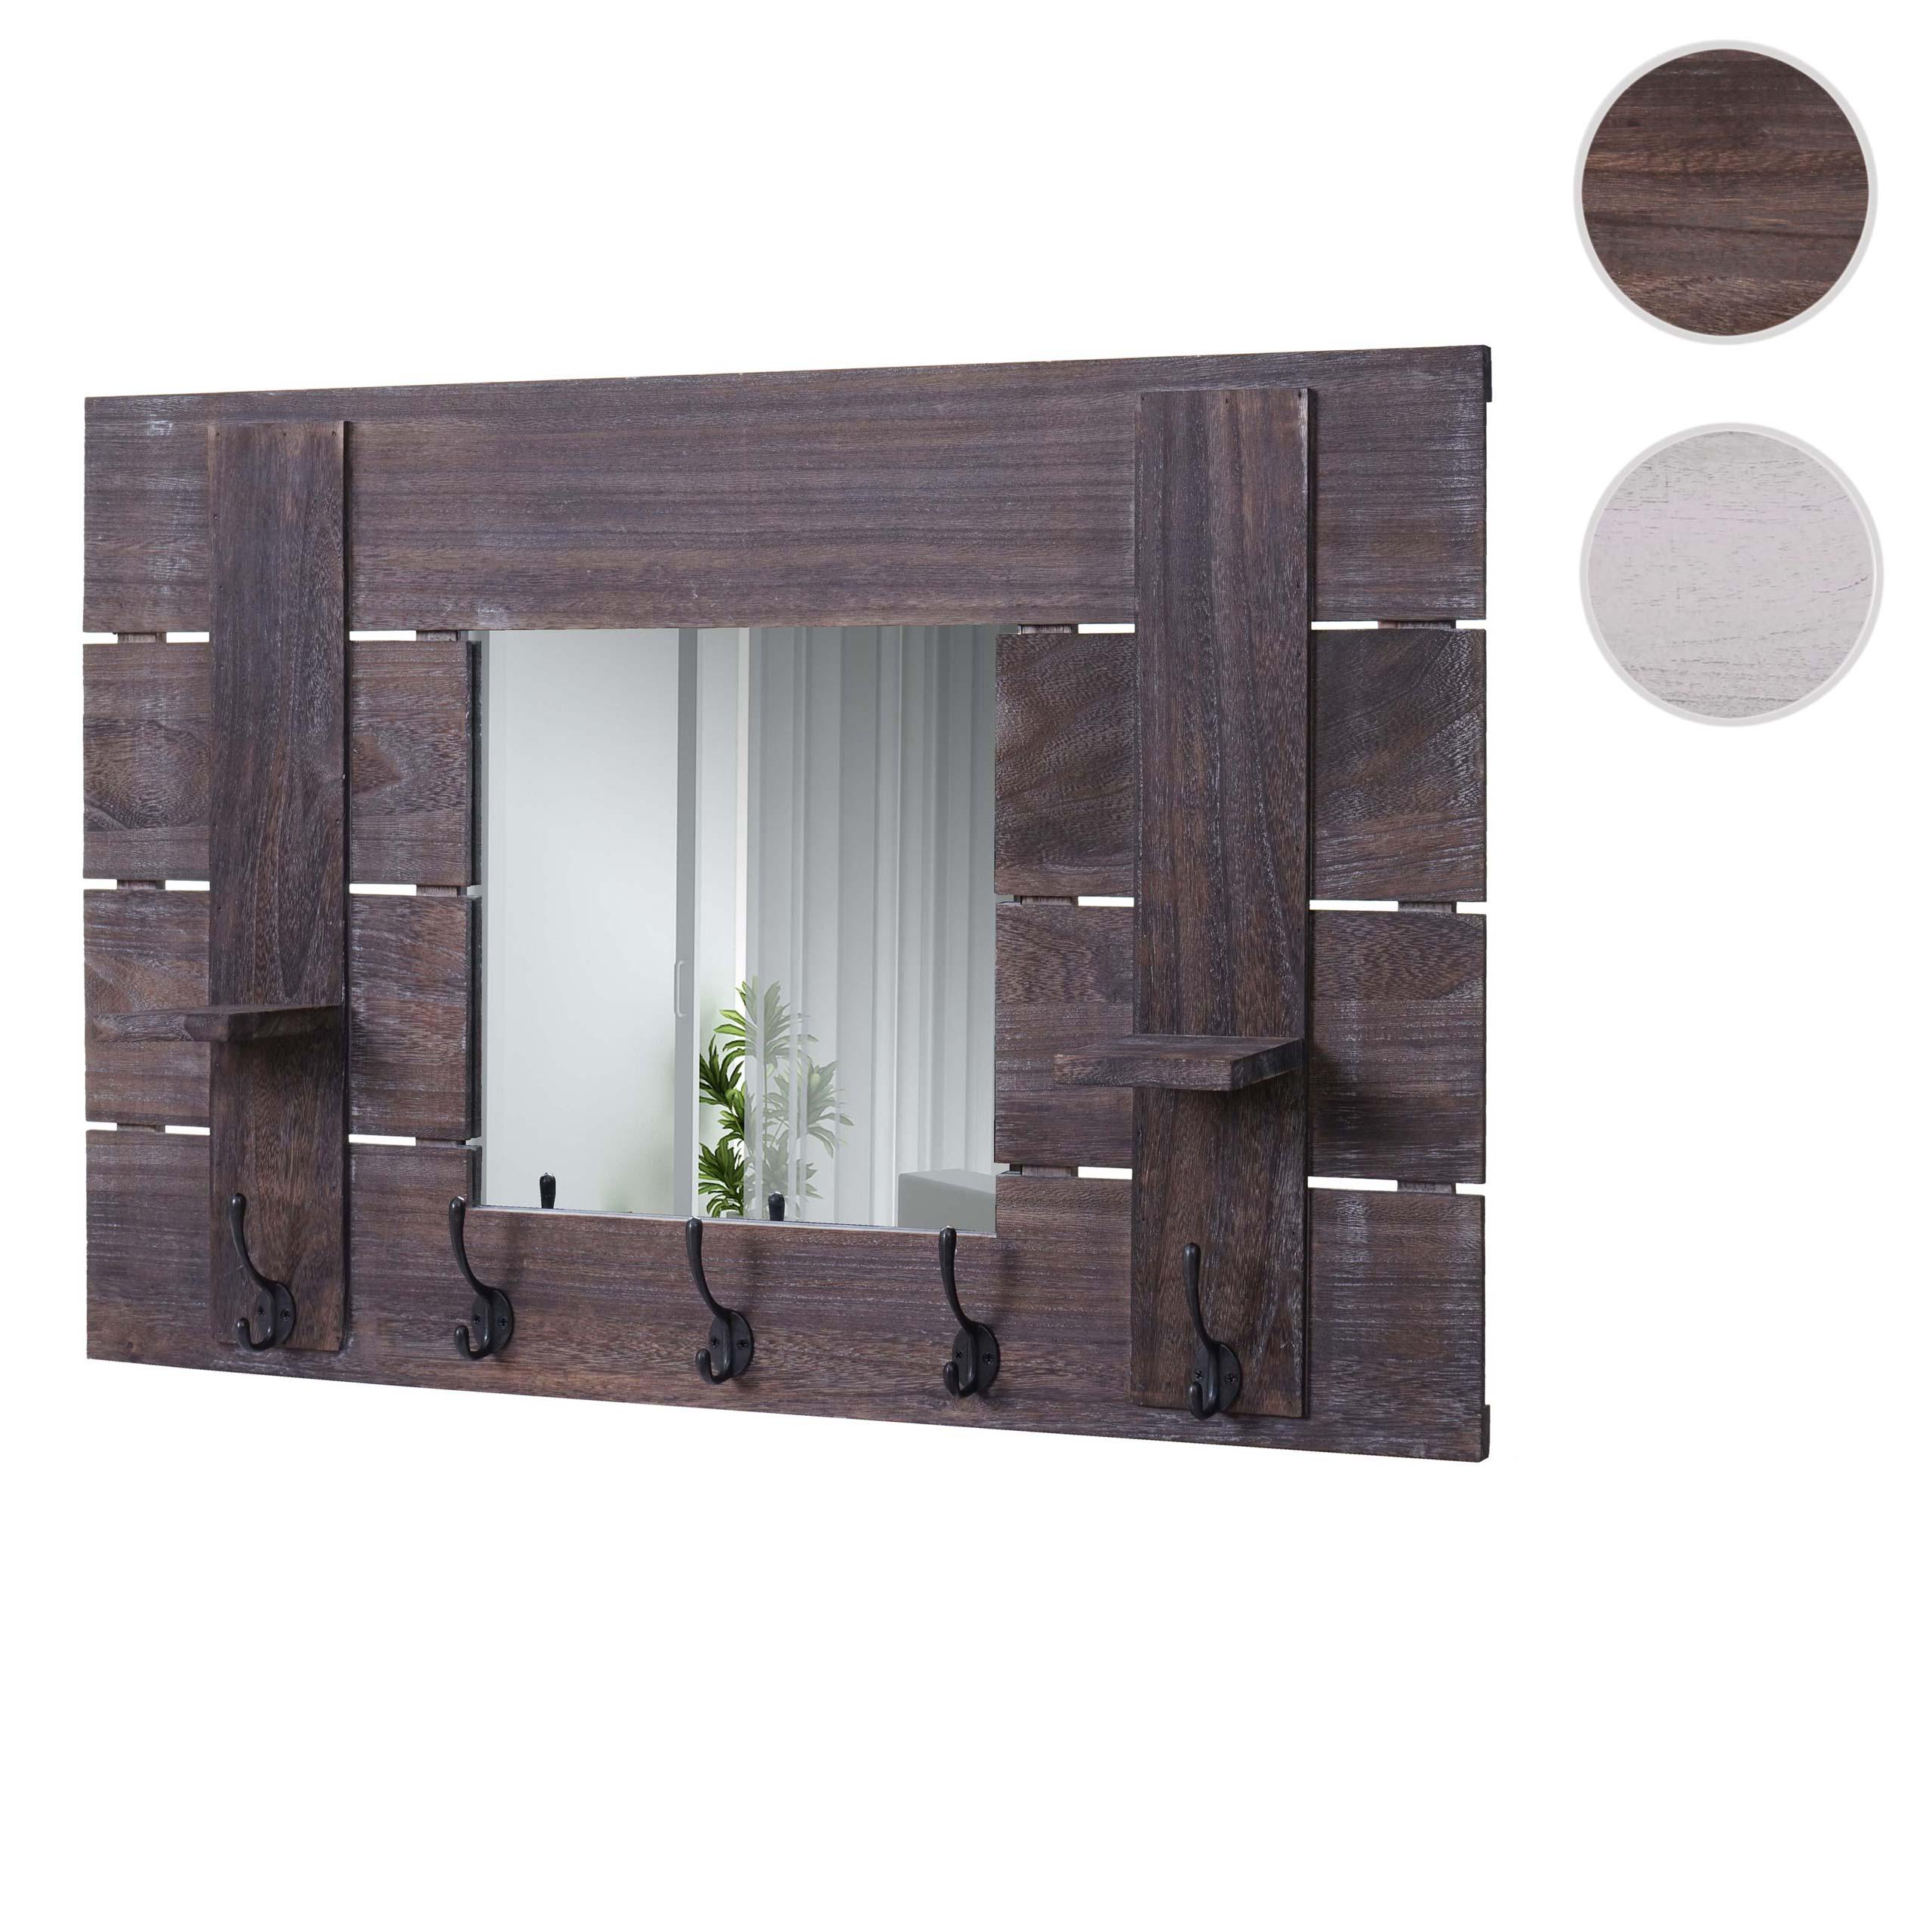 wandgarderobe hwc c89 mit spiegel garderobenpaneel. Black Bedroom Furniture Sets. Home Design Ideas